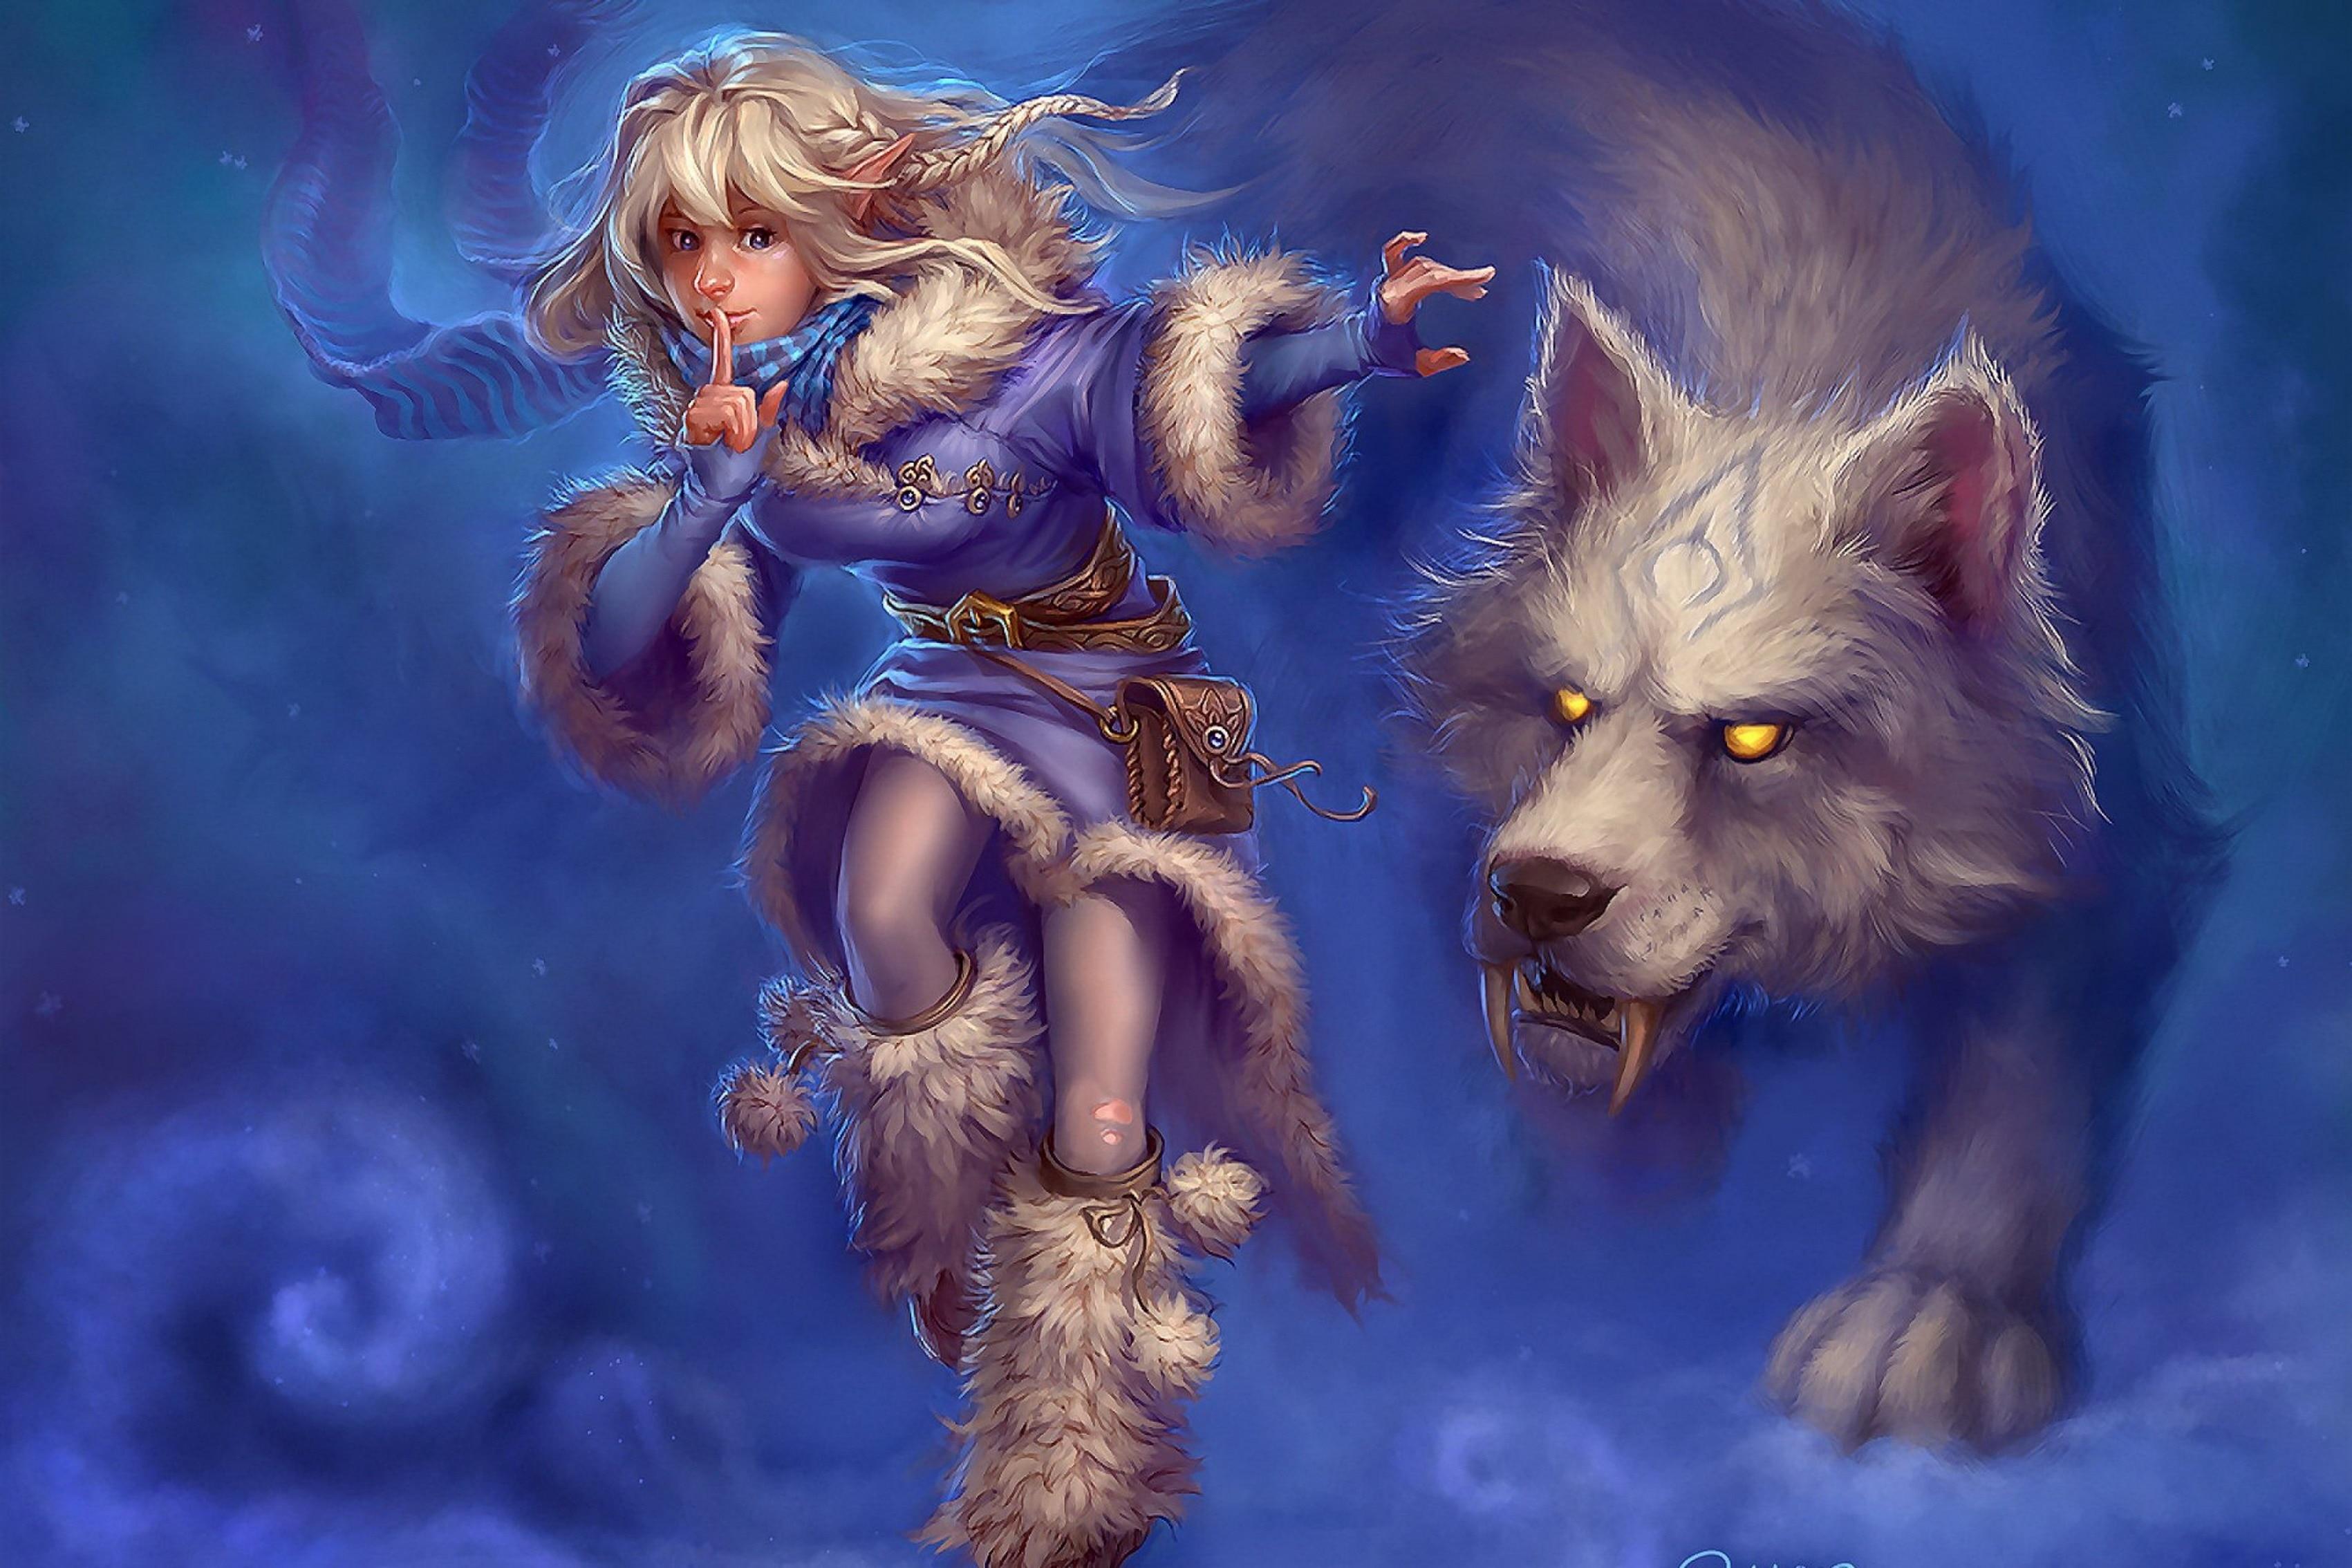 Home decoration fantasy art artwork girls women red riding hood wolf wolves Silk Fabric Poster Print DM421